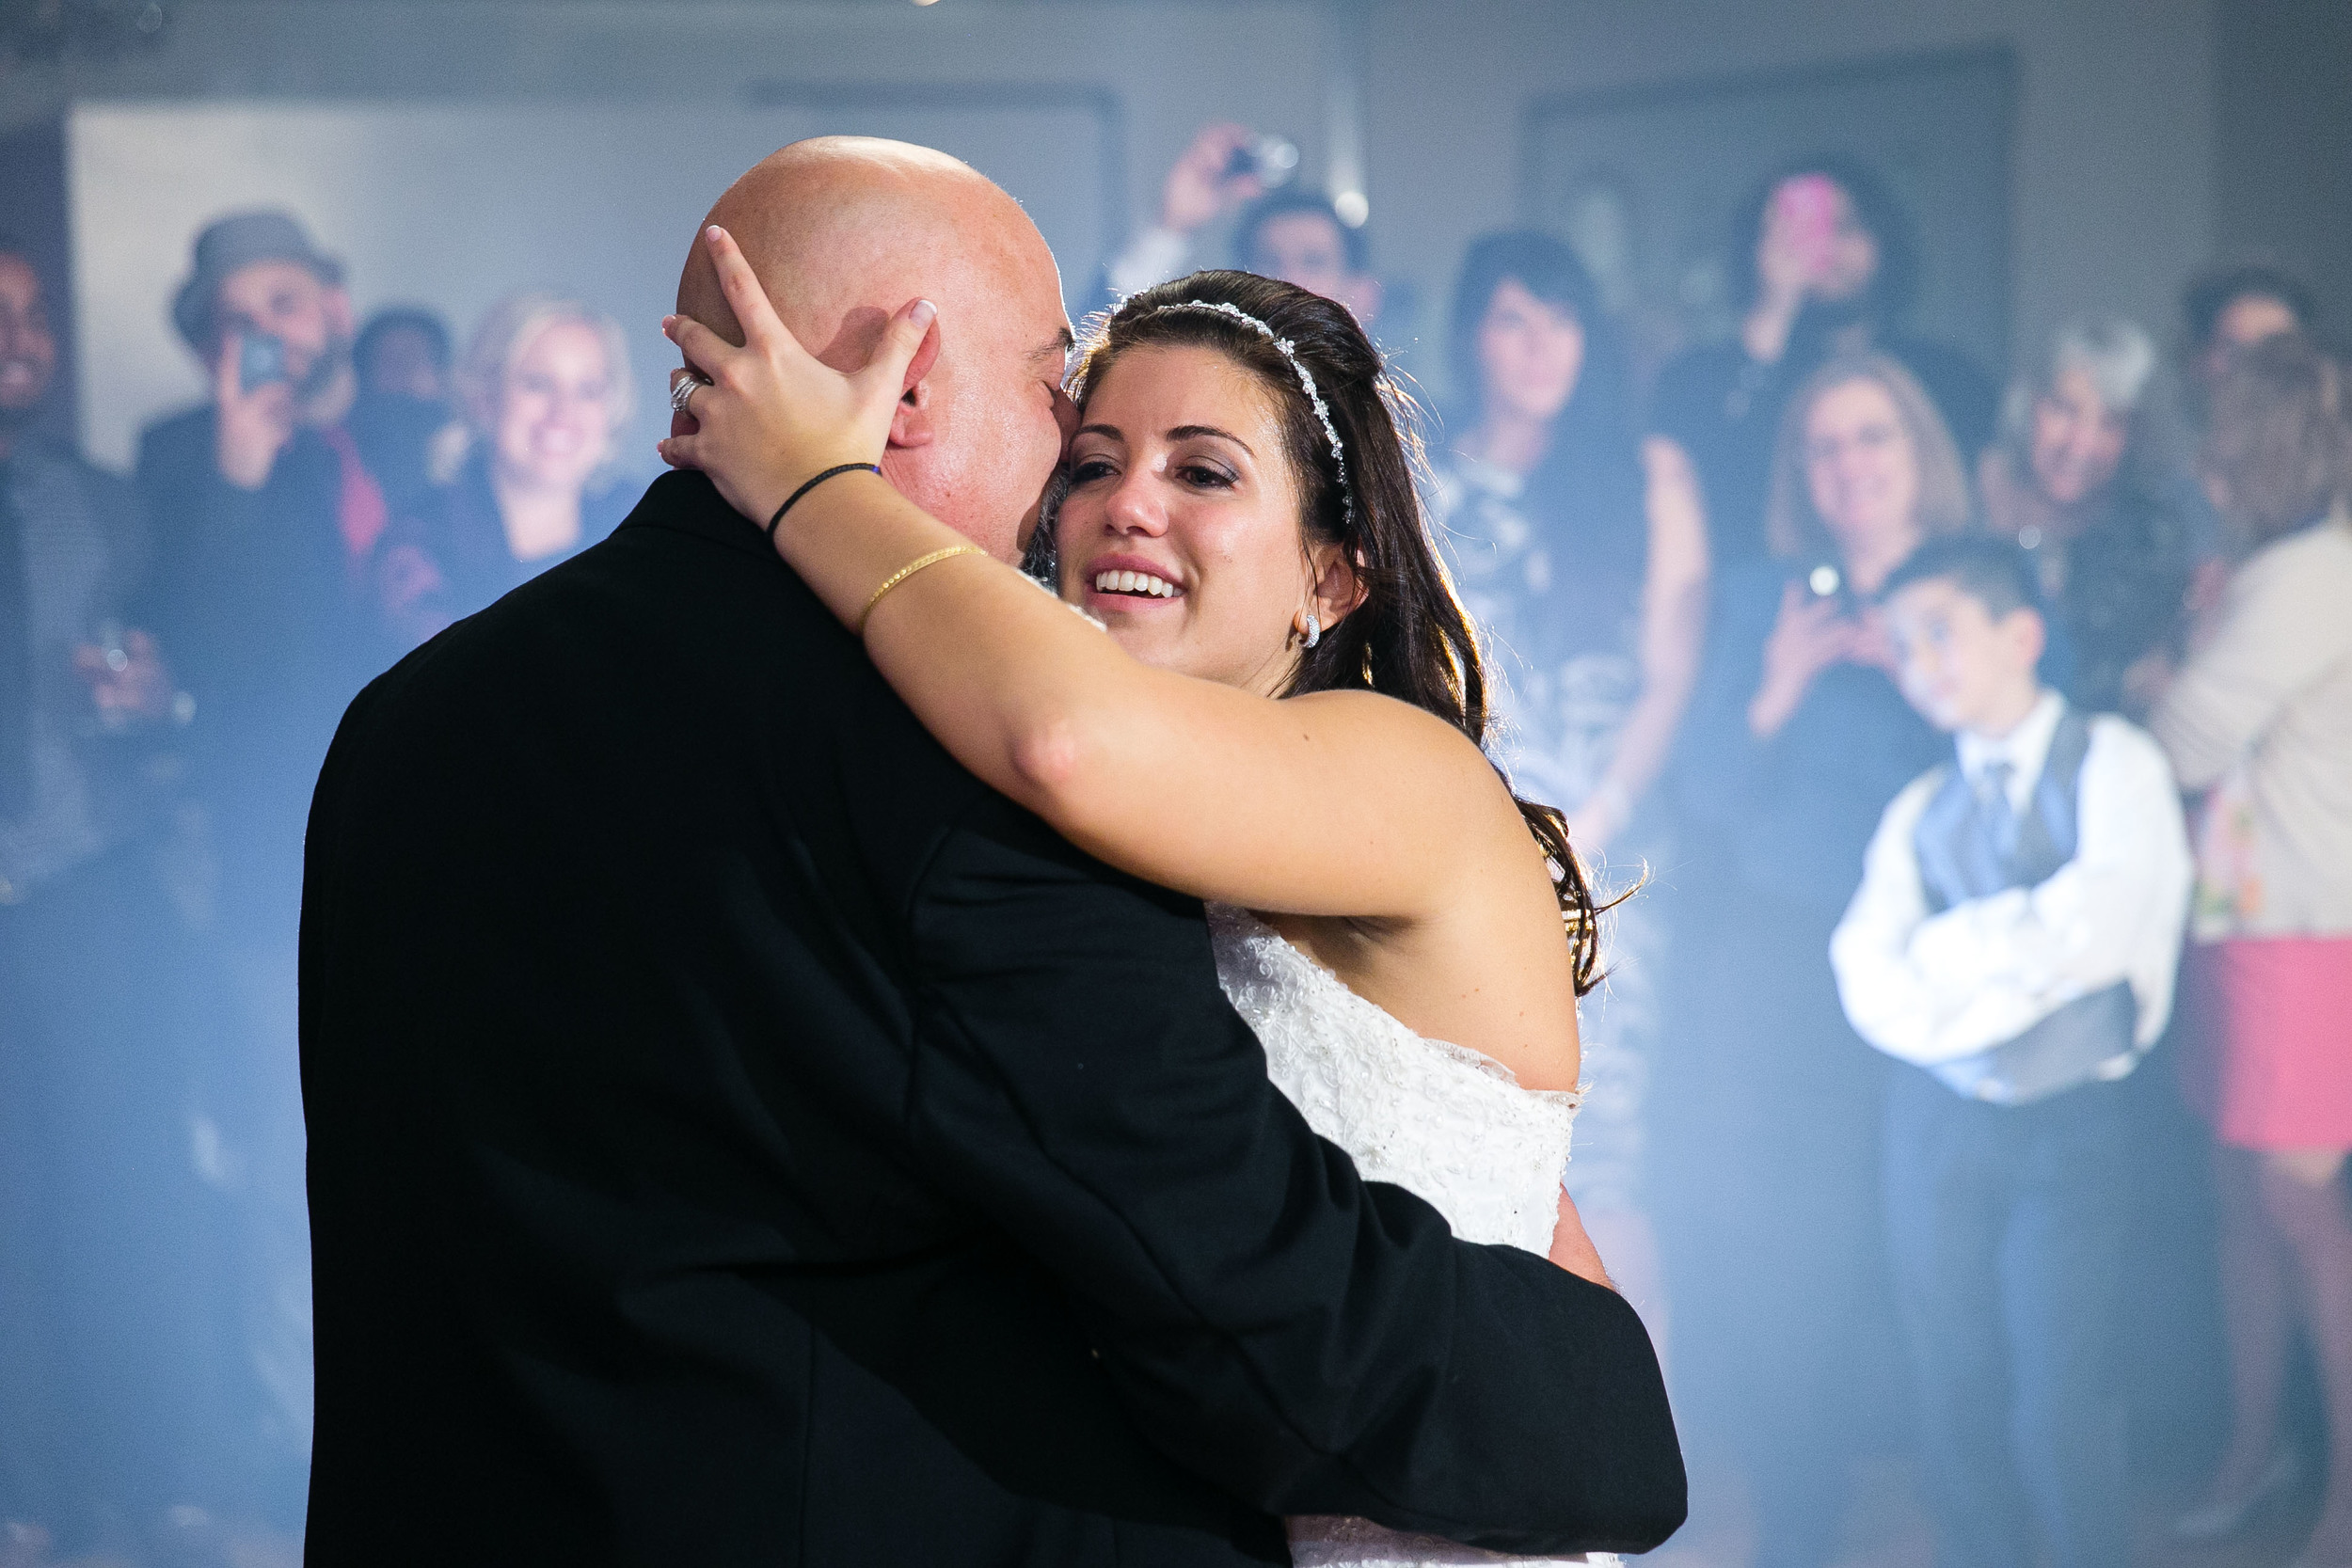 Greek-Wedding-Hartford-La-Notte-Restaurant-Connecticut-Documentary-Wedding-Photography-by-Jacek-Dolata-22.jpg